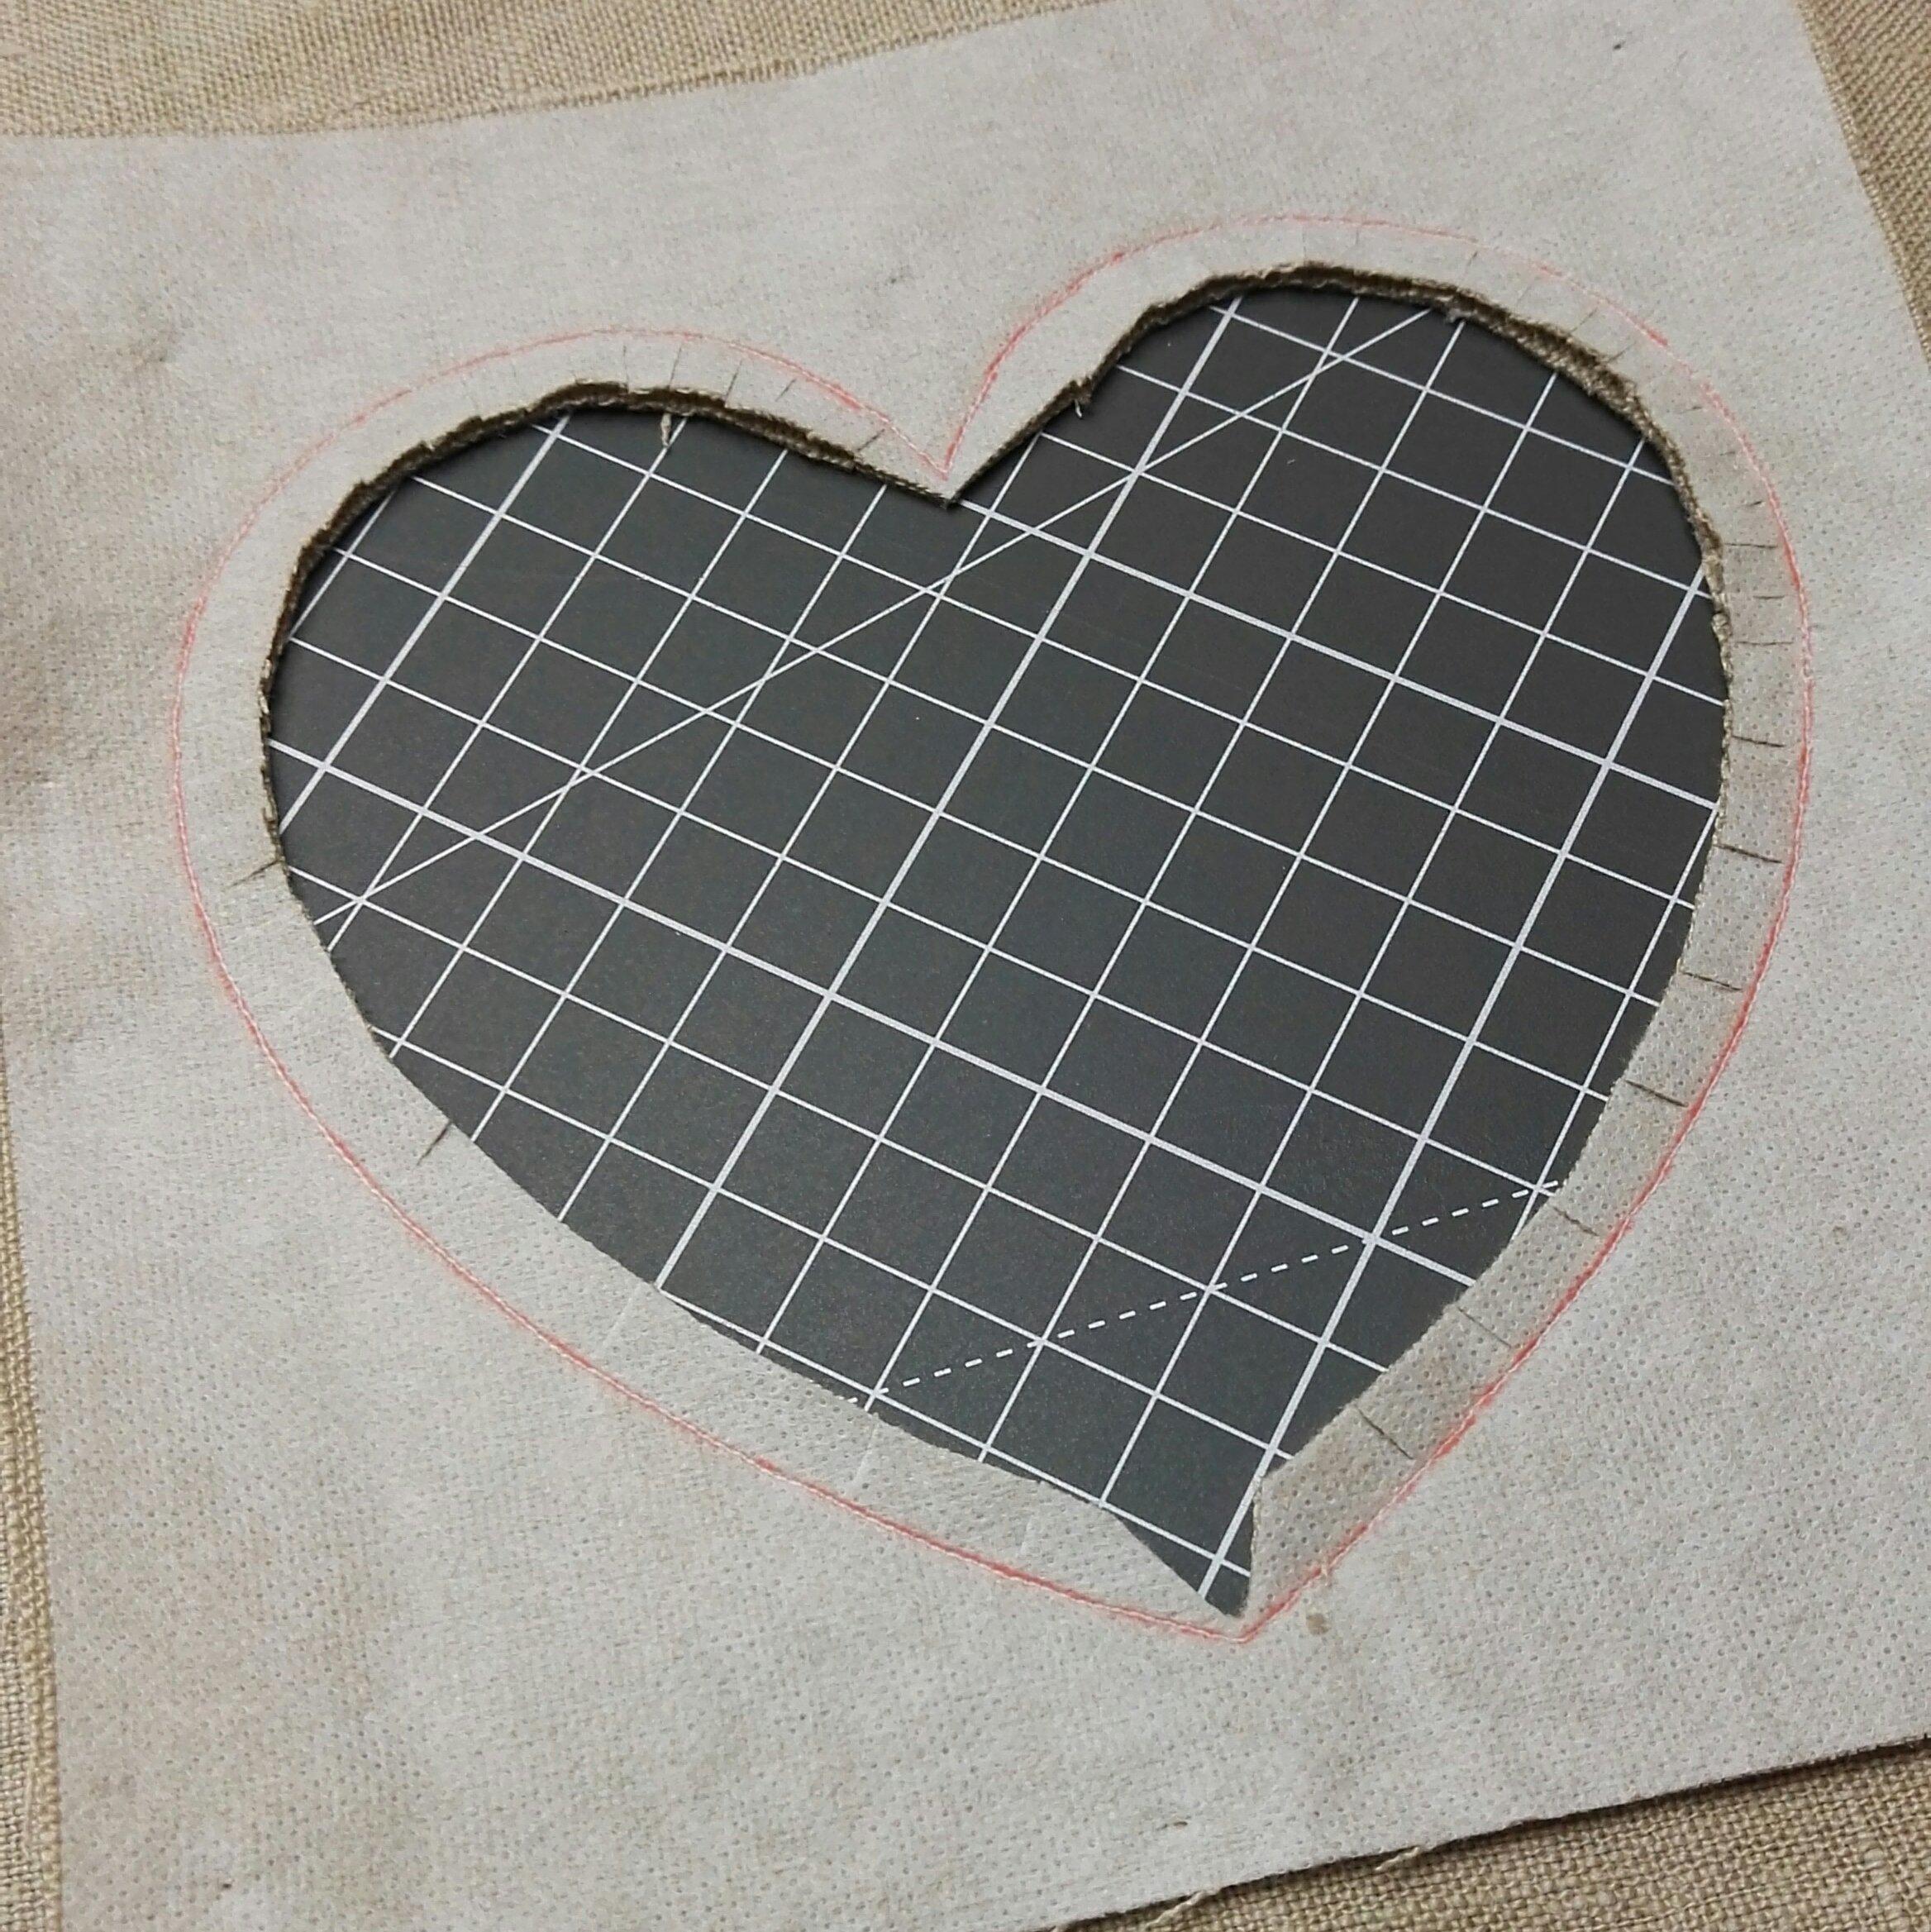 trim the heart